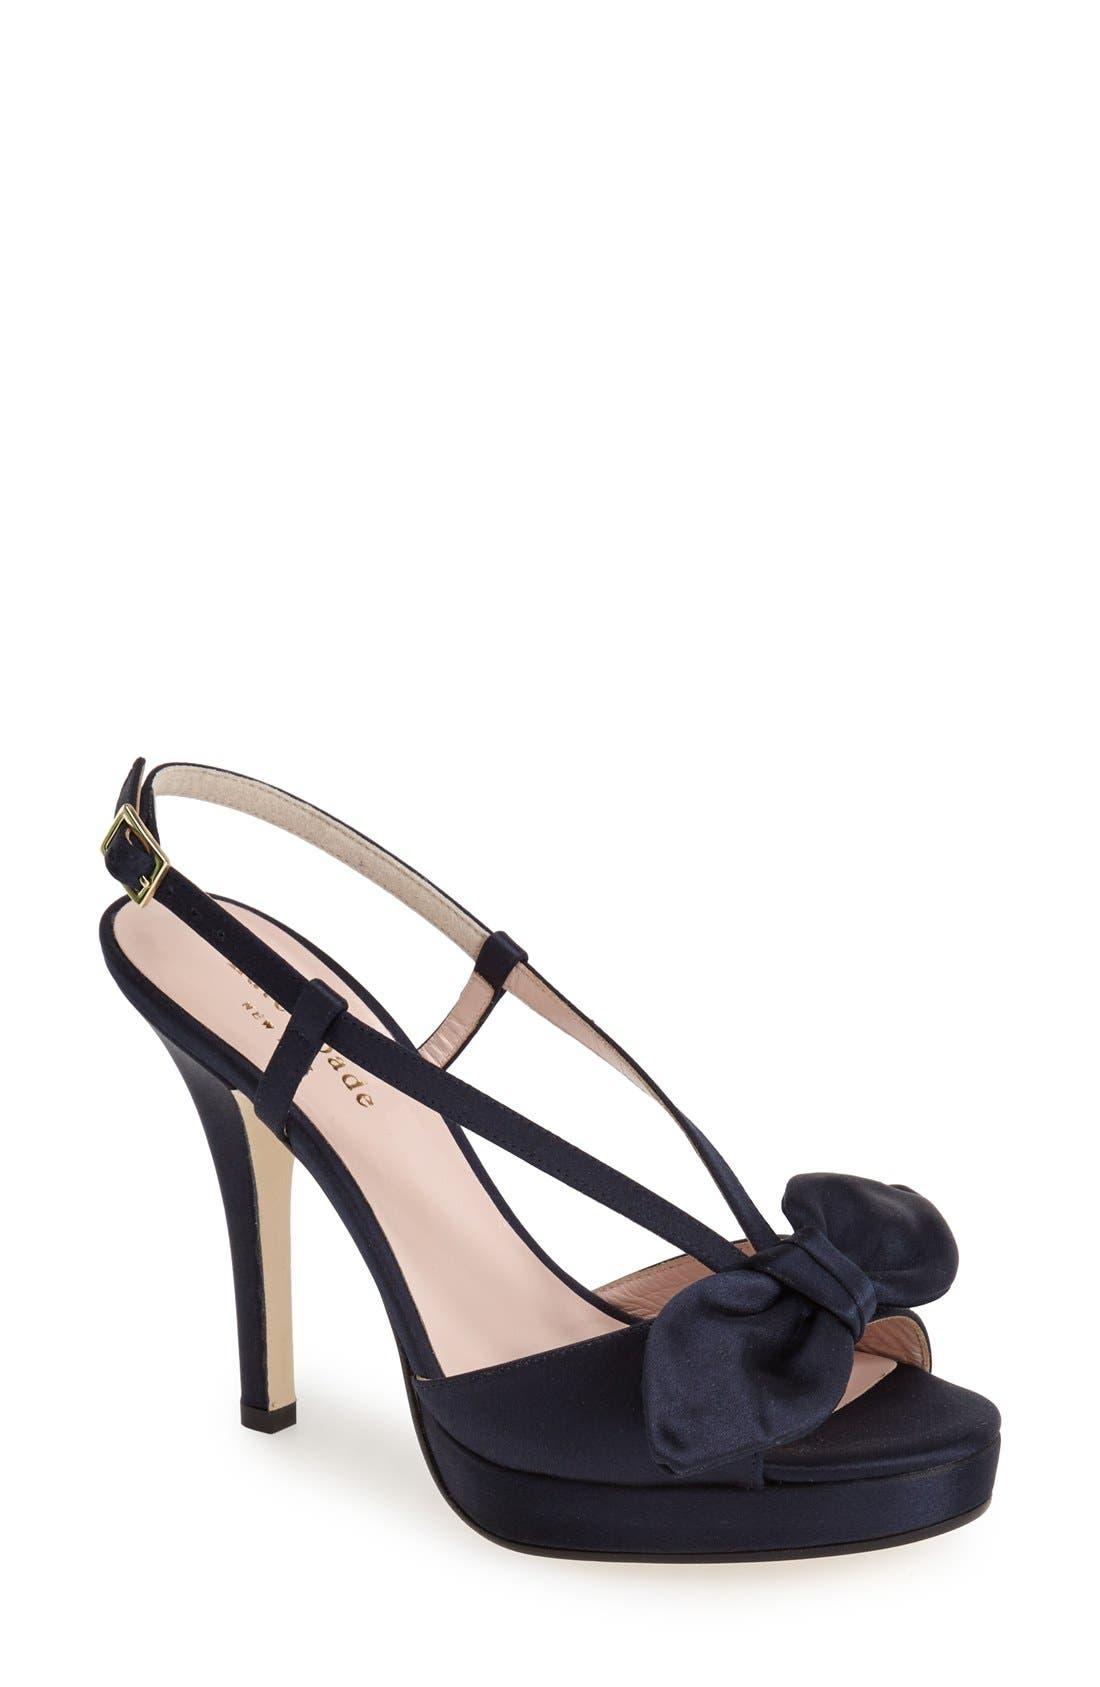 Alternate Image 1 Selected - kate spade new york 'rezza' platform sandal (Women)